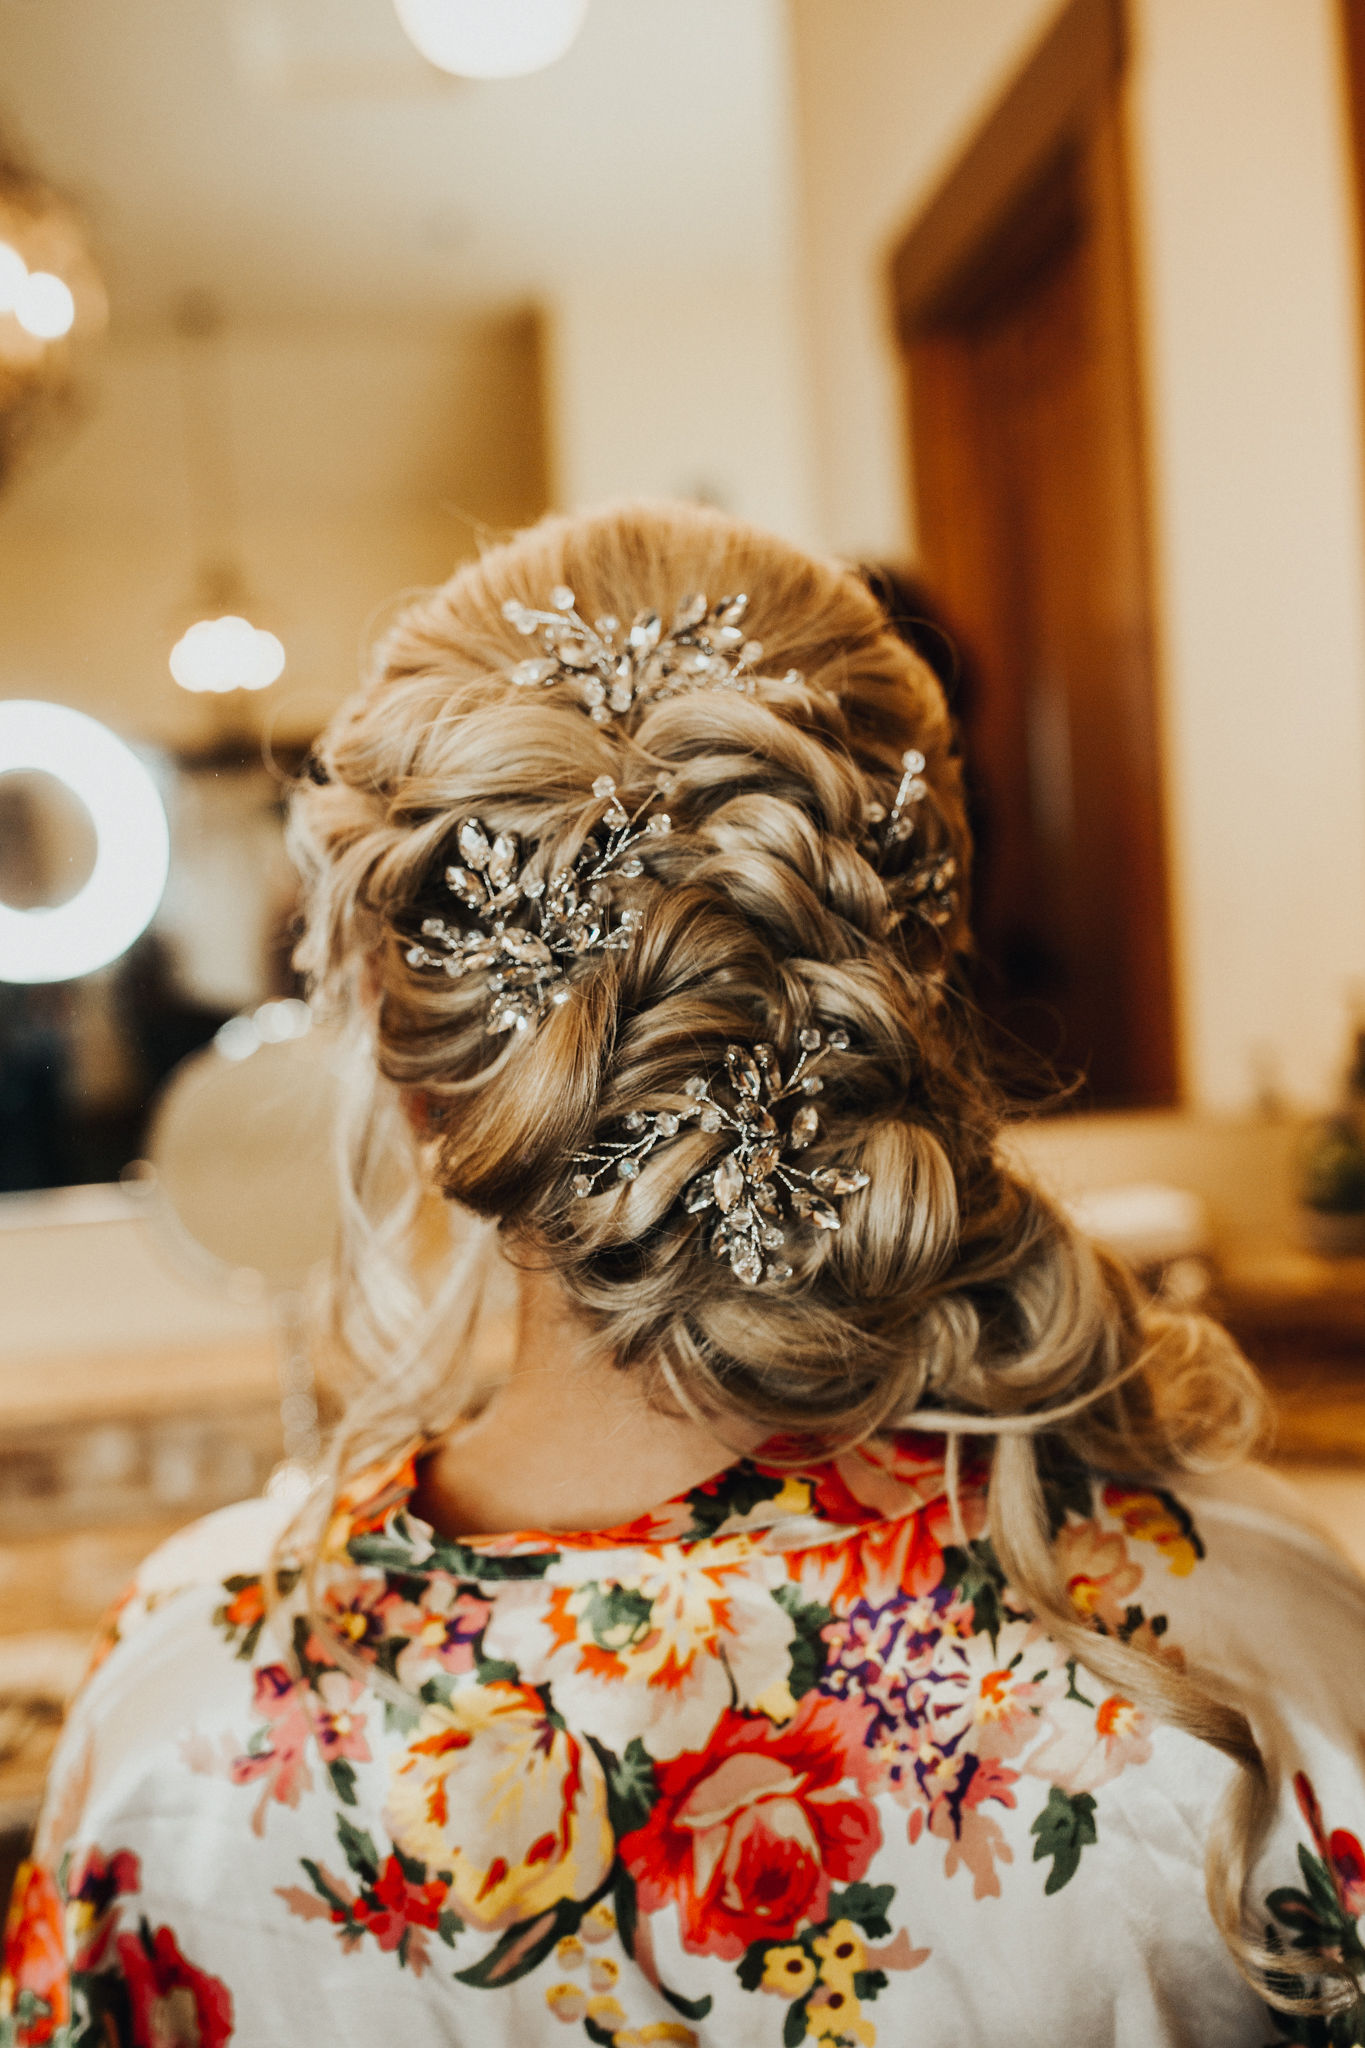 La Muse Hair, Fashion & Beauty Salon • Desiree Neel